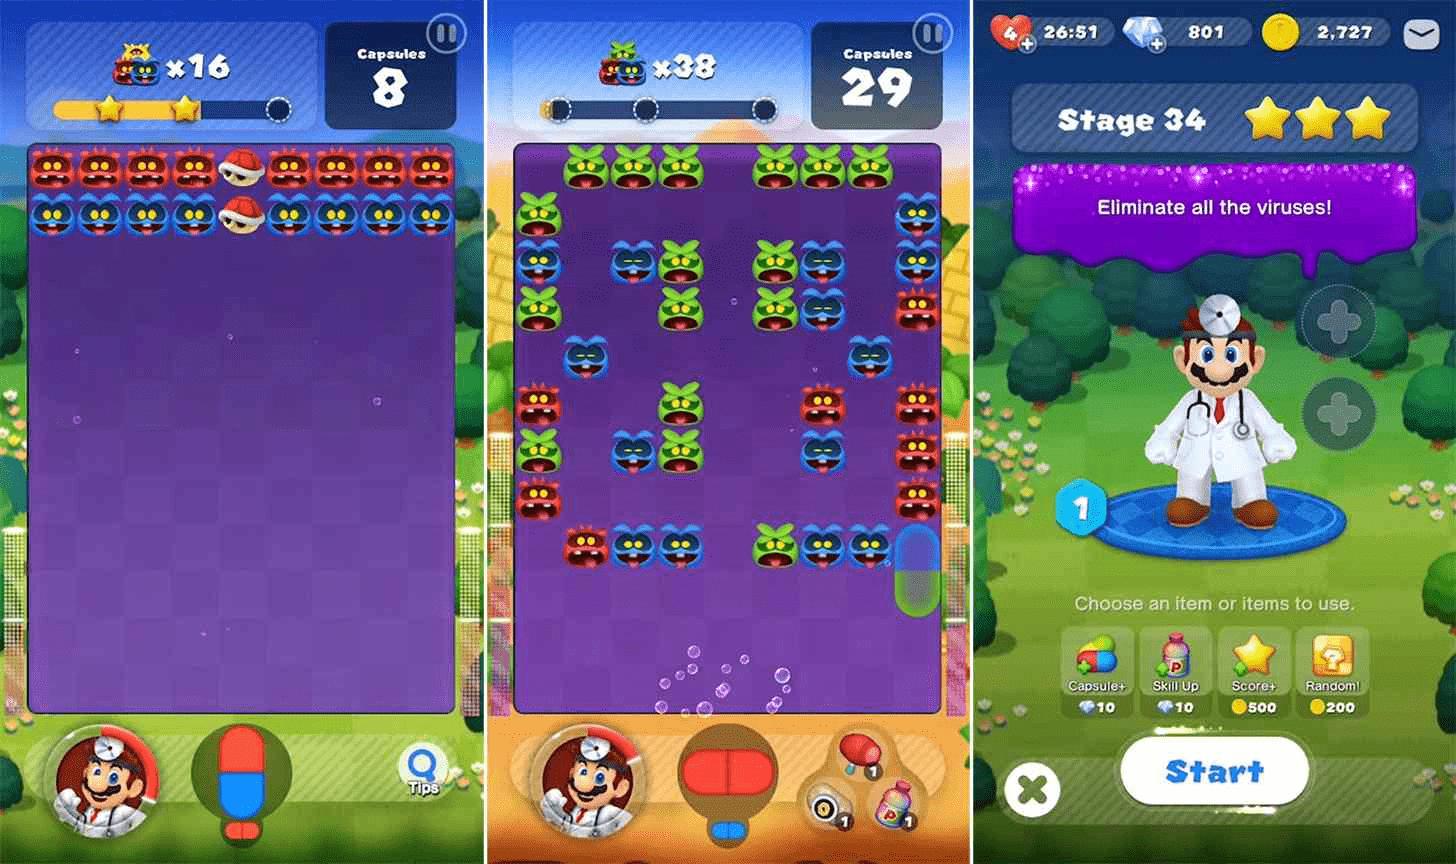 Dr. Mario World Screenshot 3